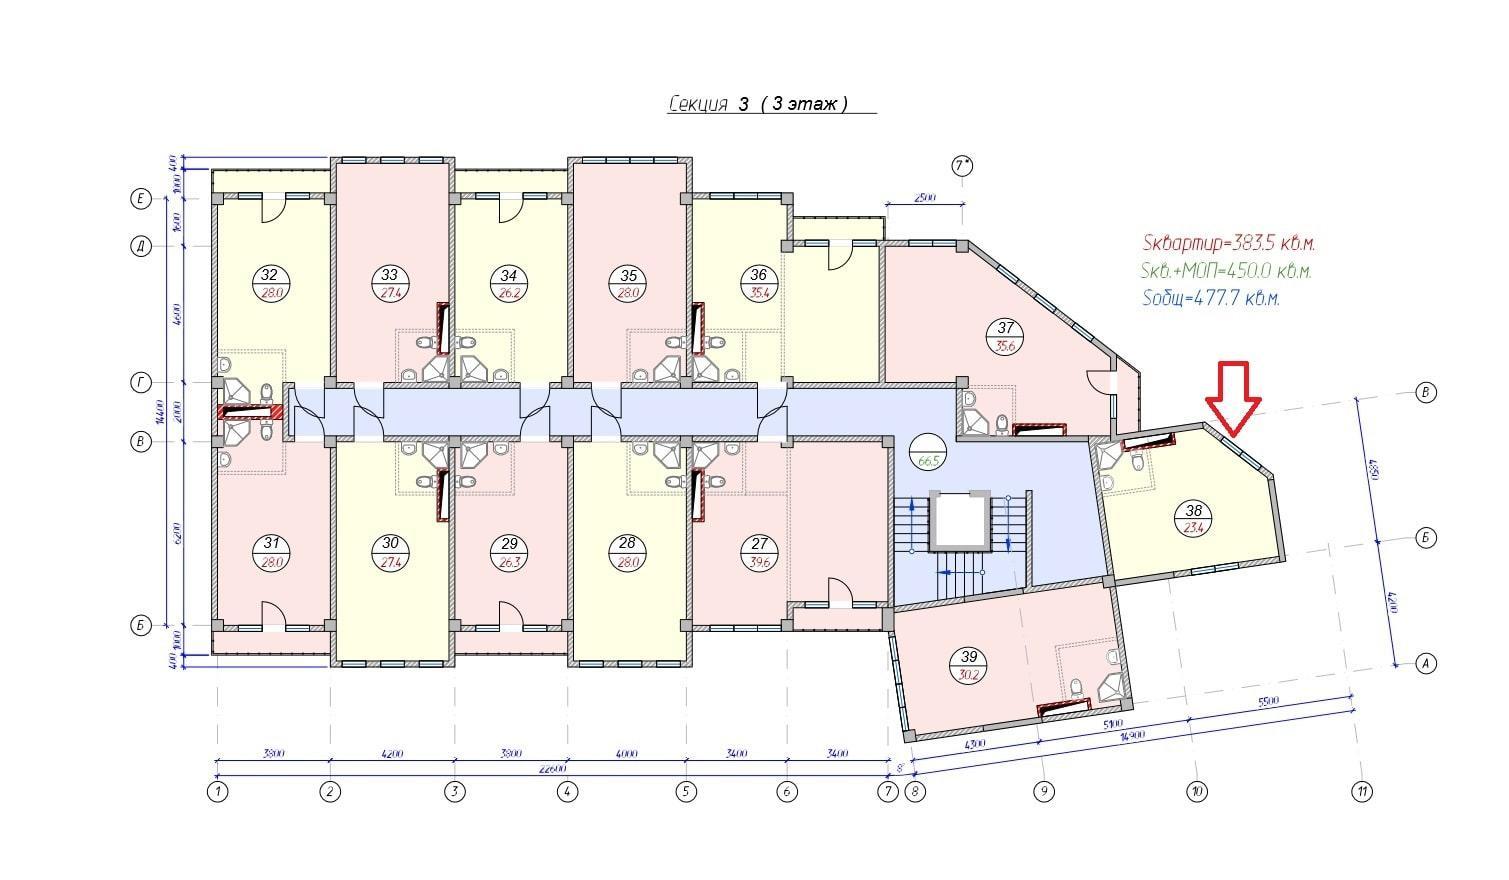 ЖК СочиЛайфПарк Квартира студия 3 этаж